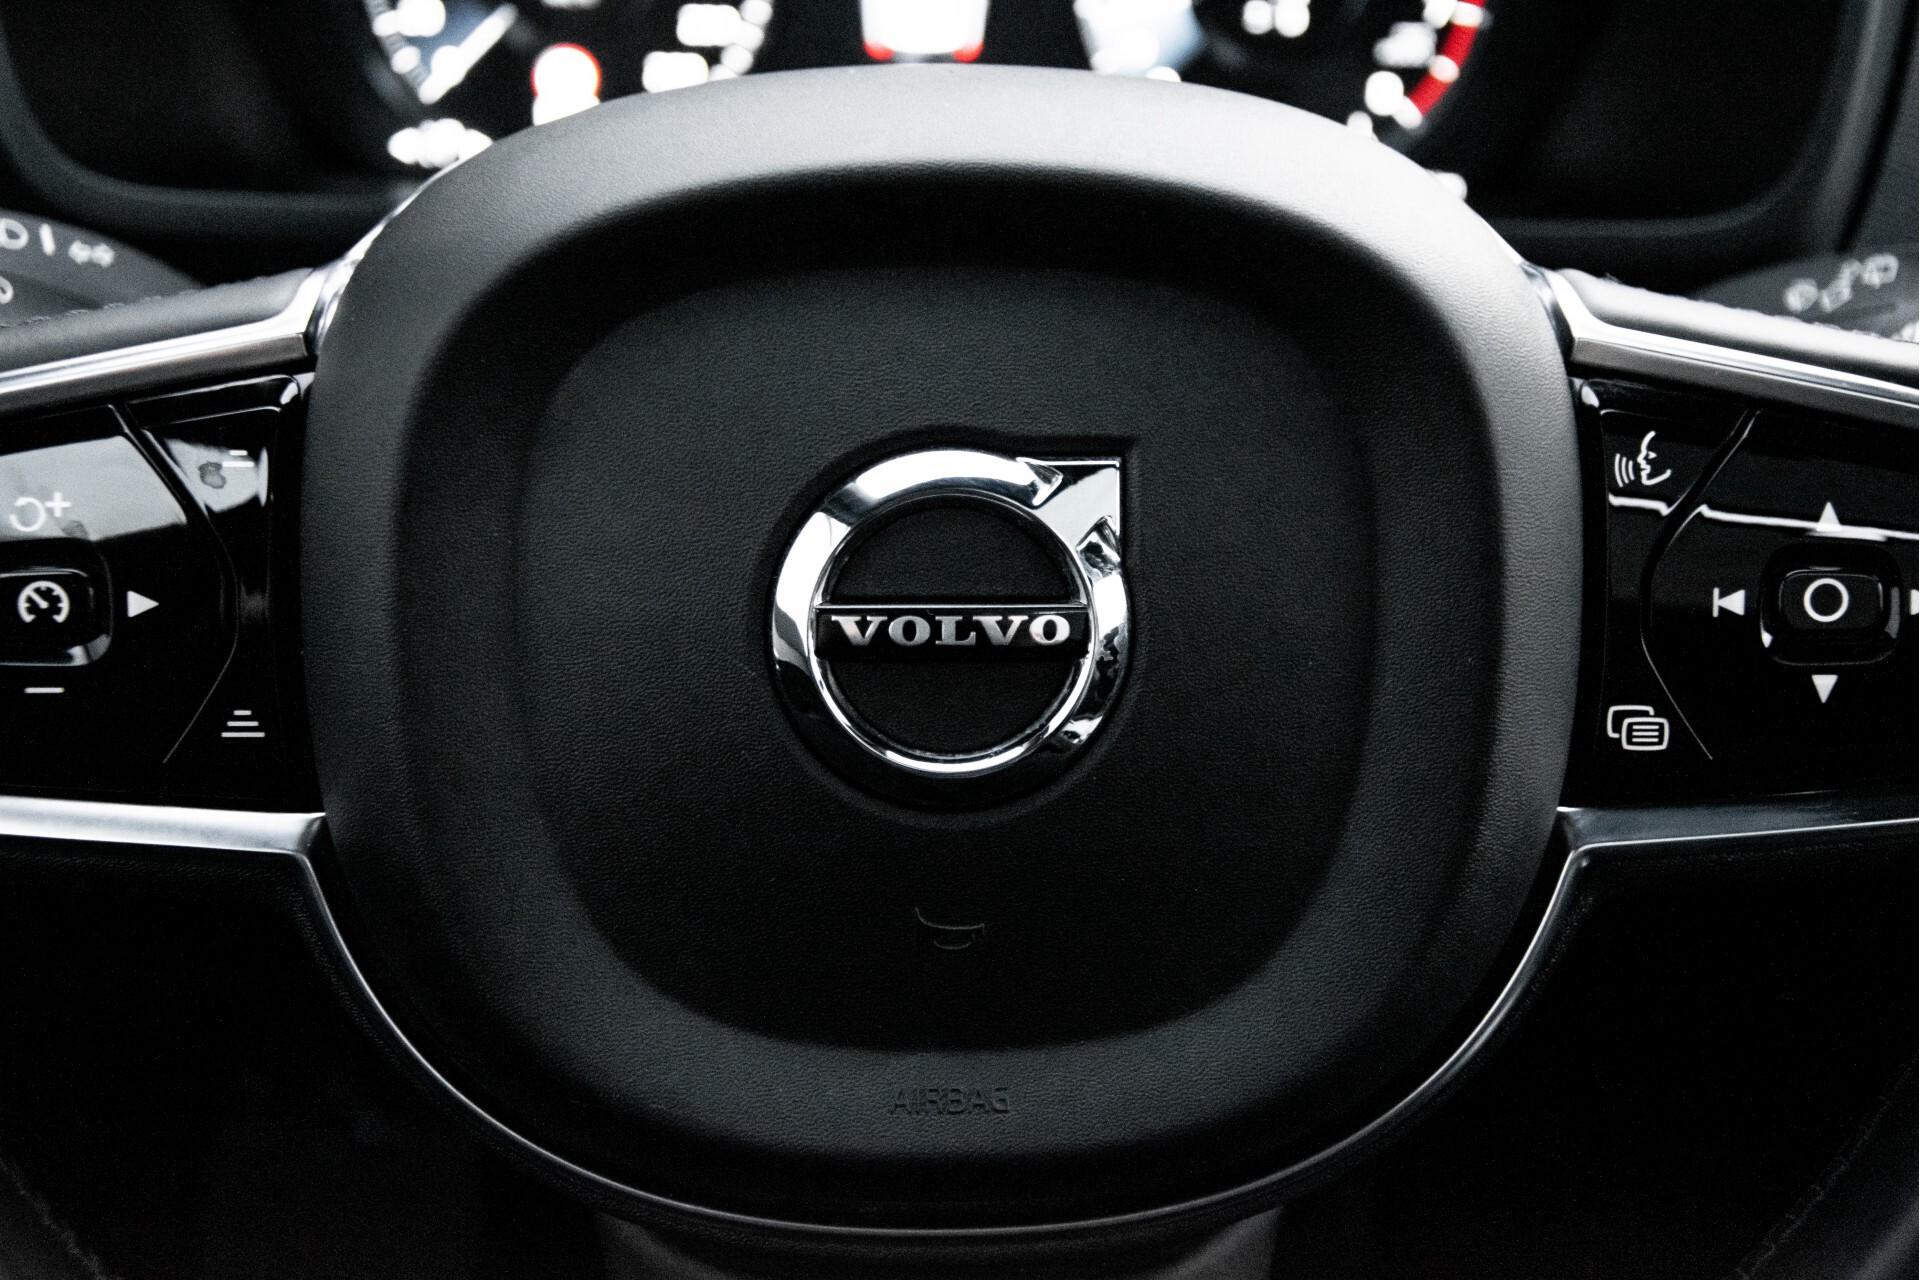 "Volvo XC90 2.0 T6 AWD R-Design Panorama/Keyless/B&W/ACC/Standkachel/22"" Aut8 Foto 16"